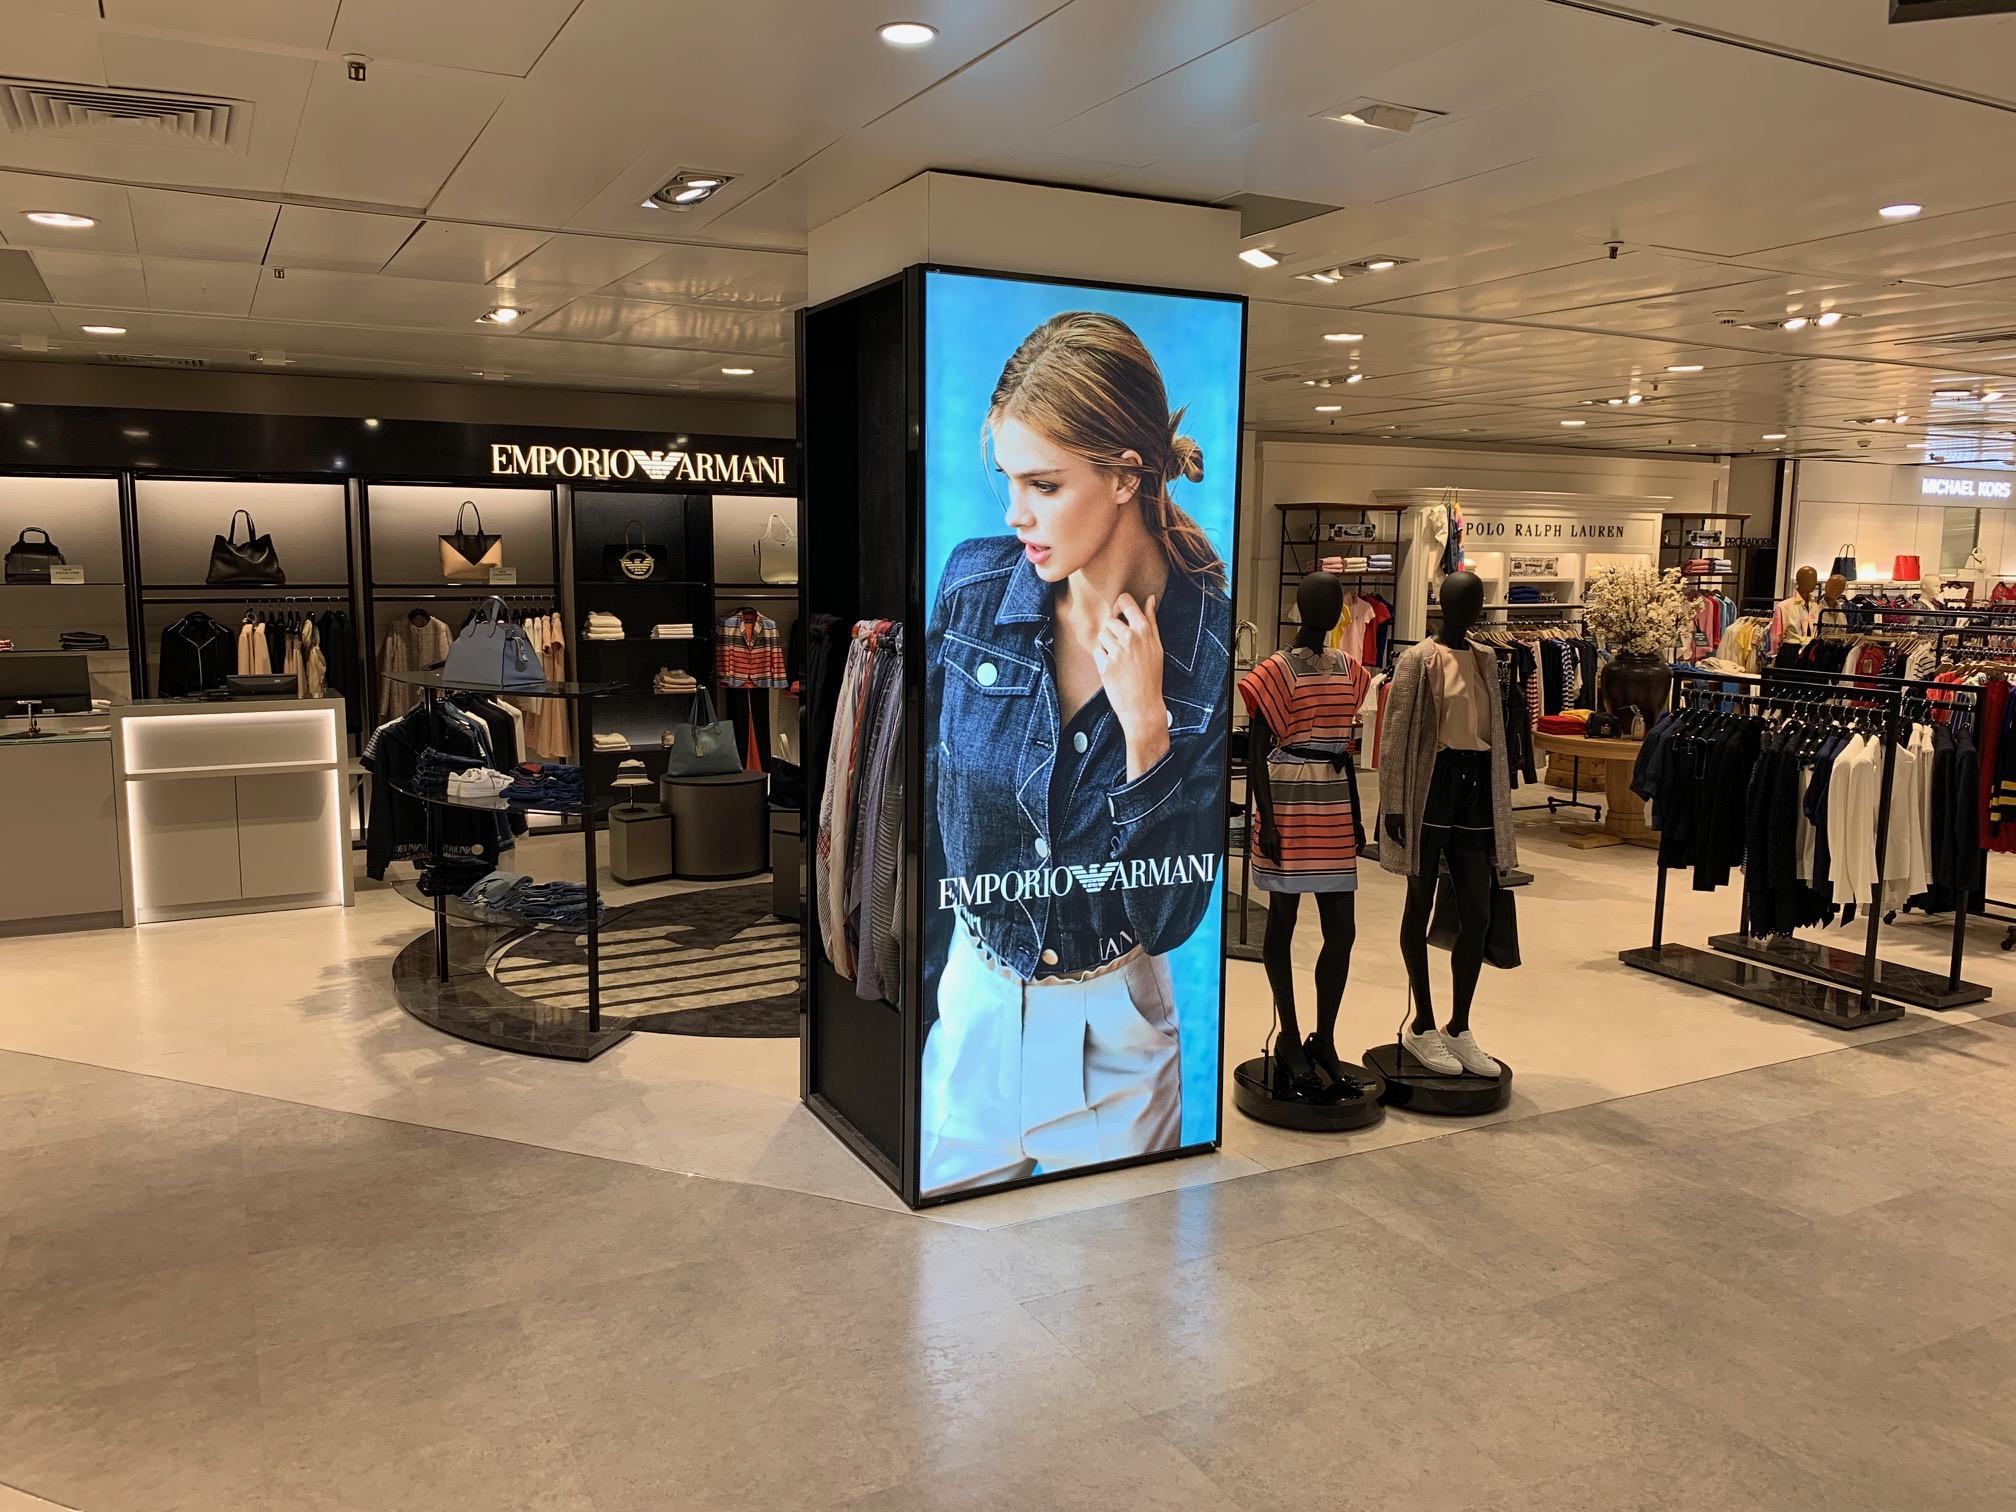 visual-merchandising-emporio-armani-donna